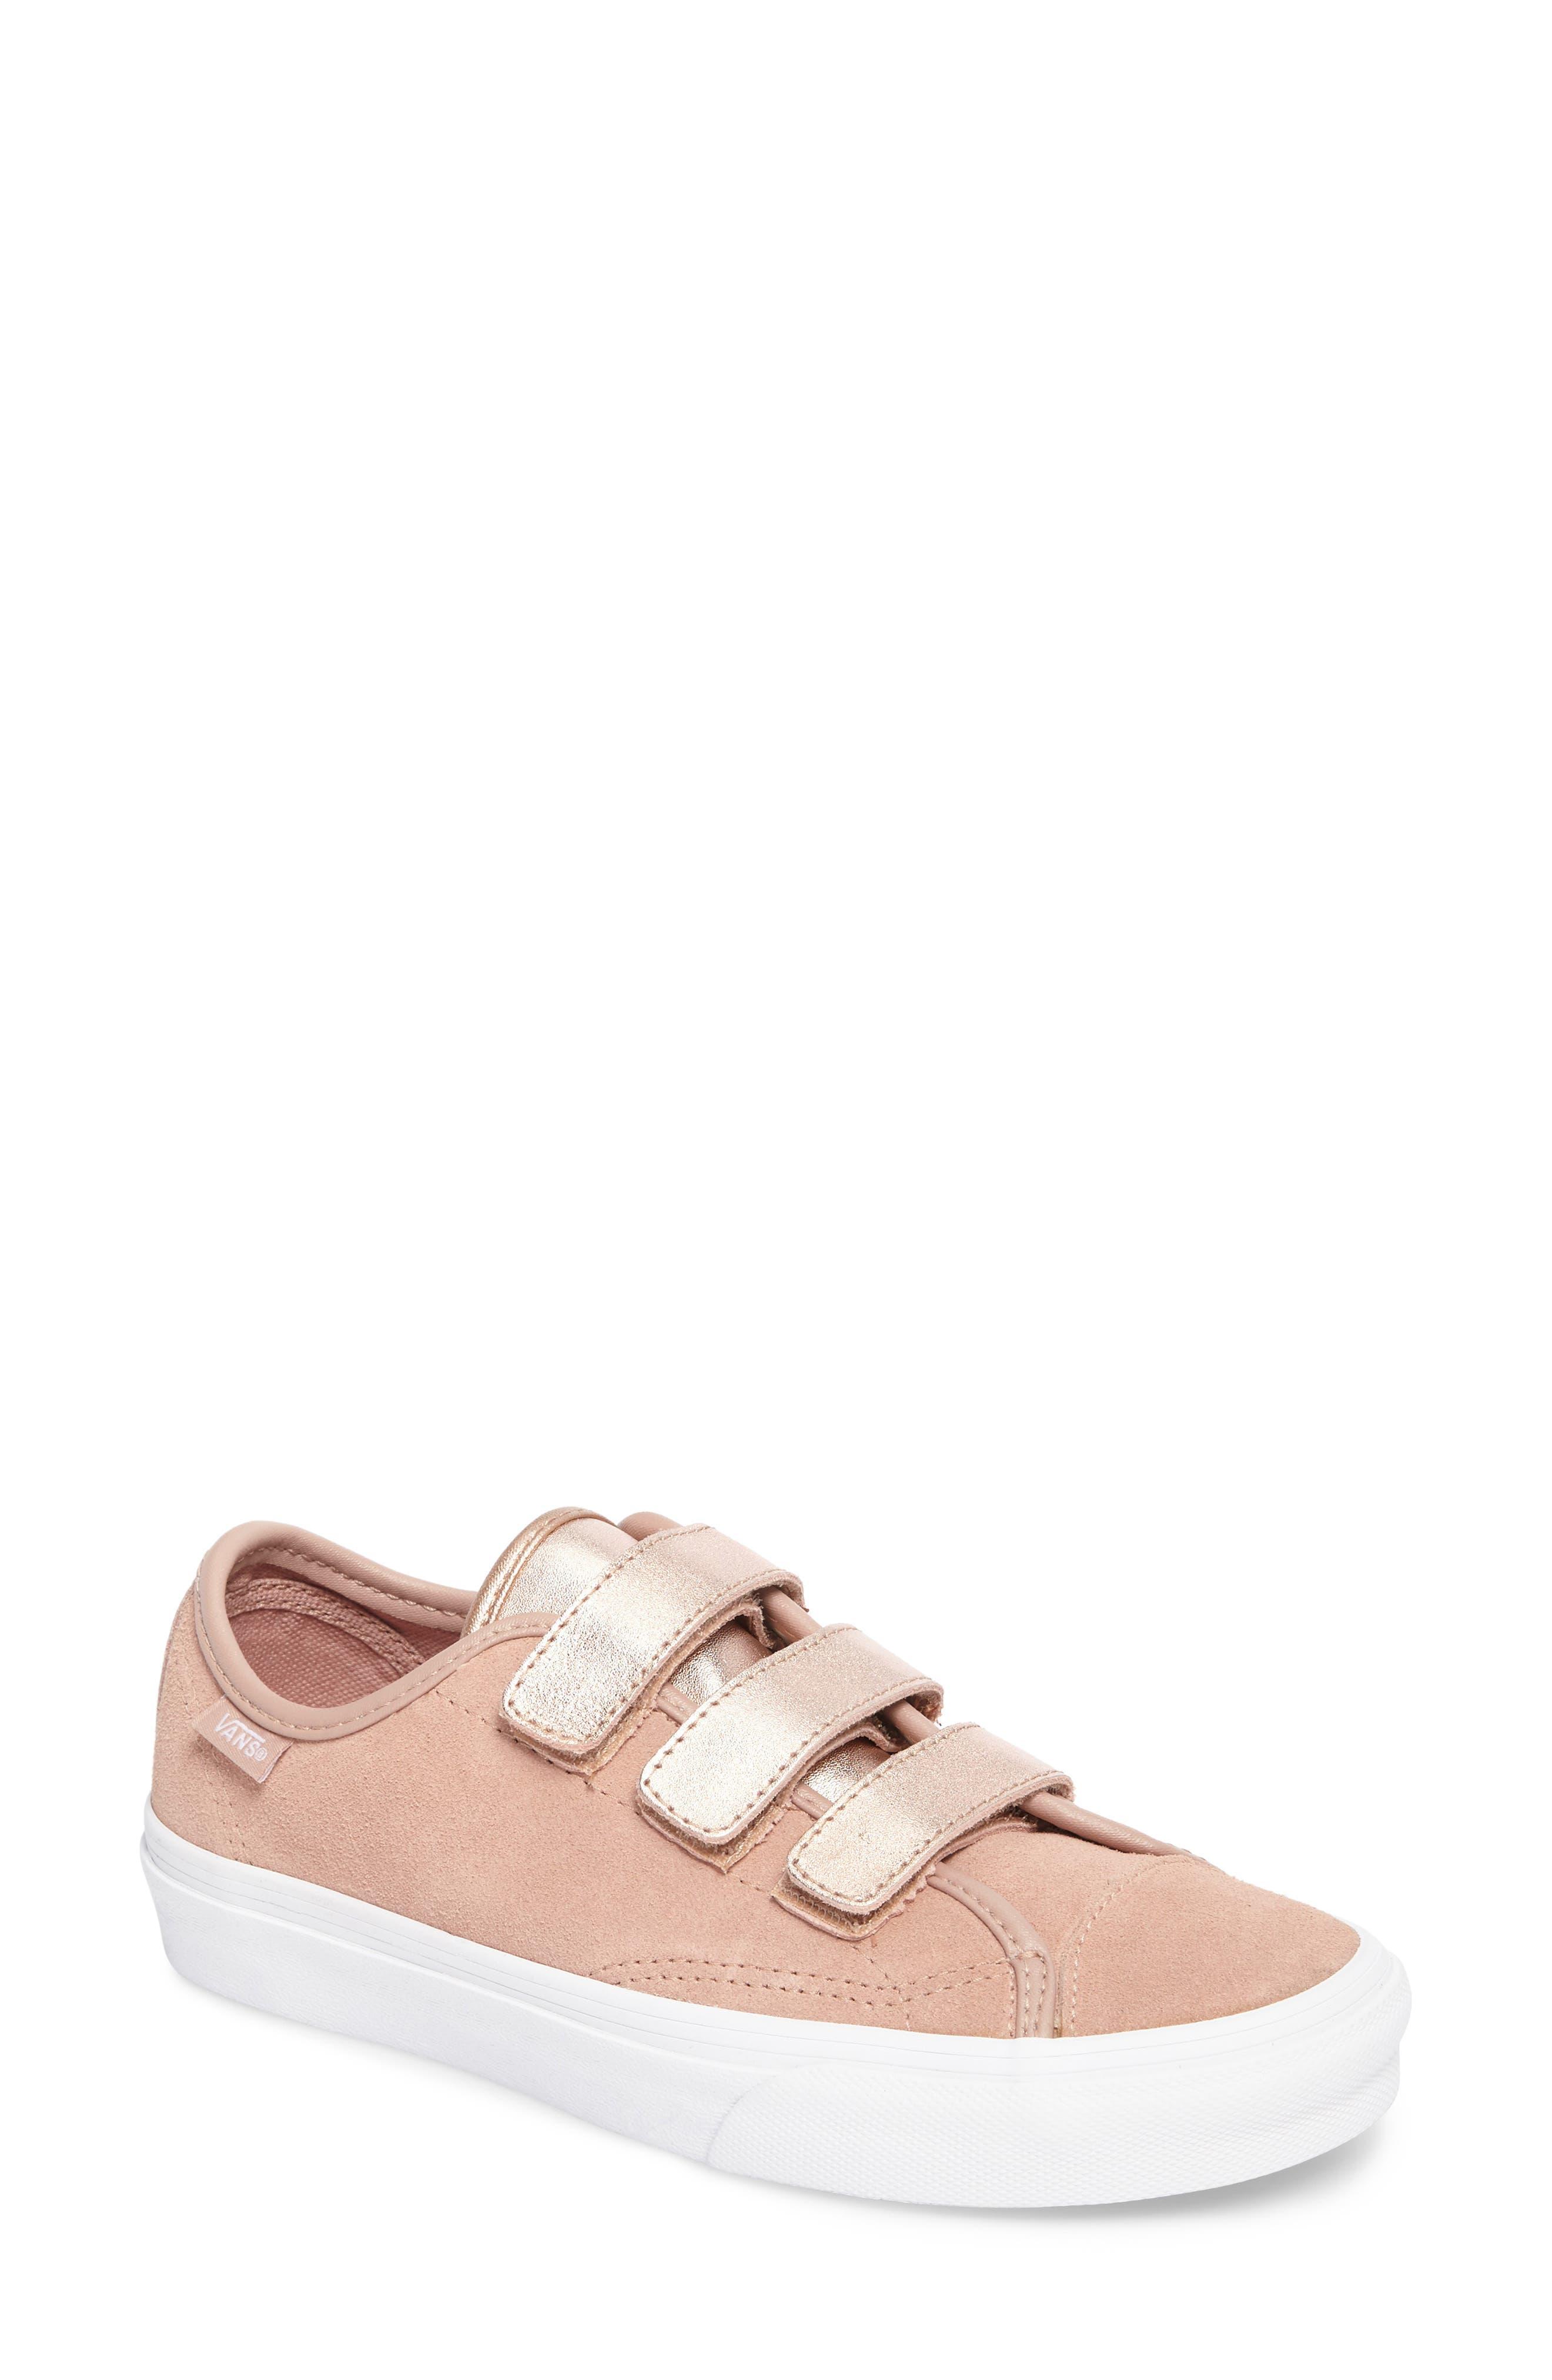 Style 23 V Sneaker,                         Main,                         color, Mahogany Rose/ True White